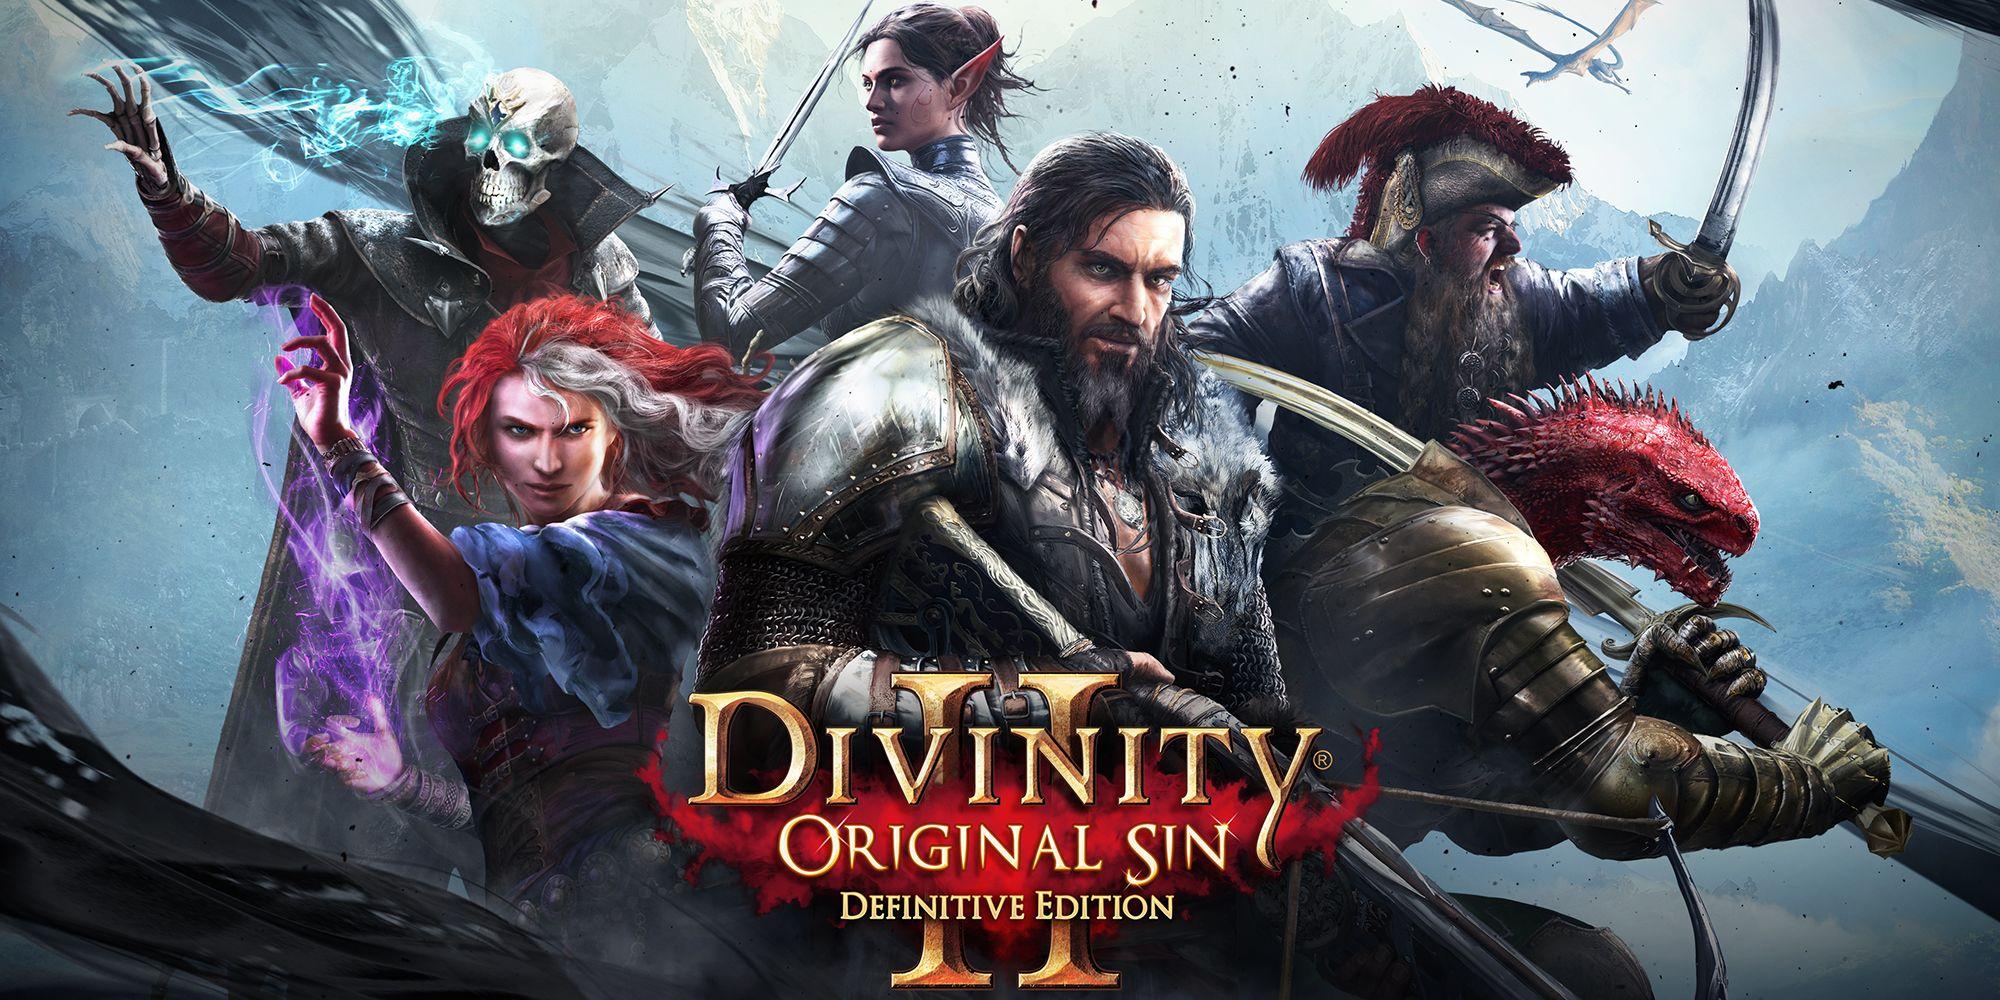 Divinity-Original-Sin-2-Definitive-Edition.jpg